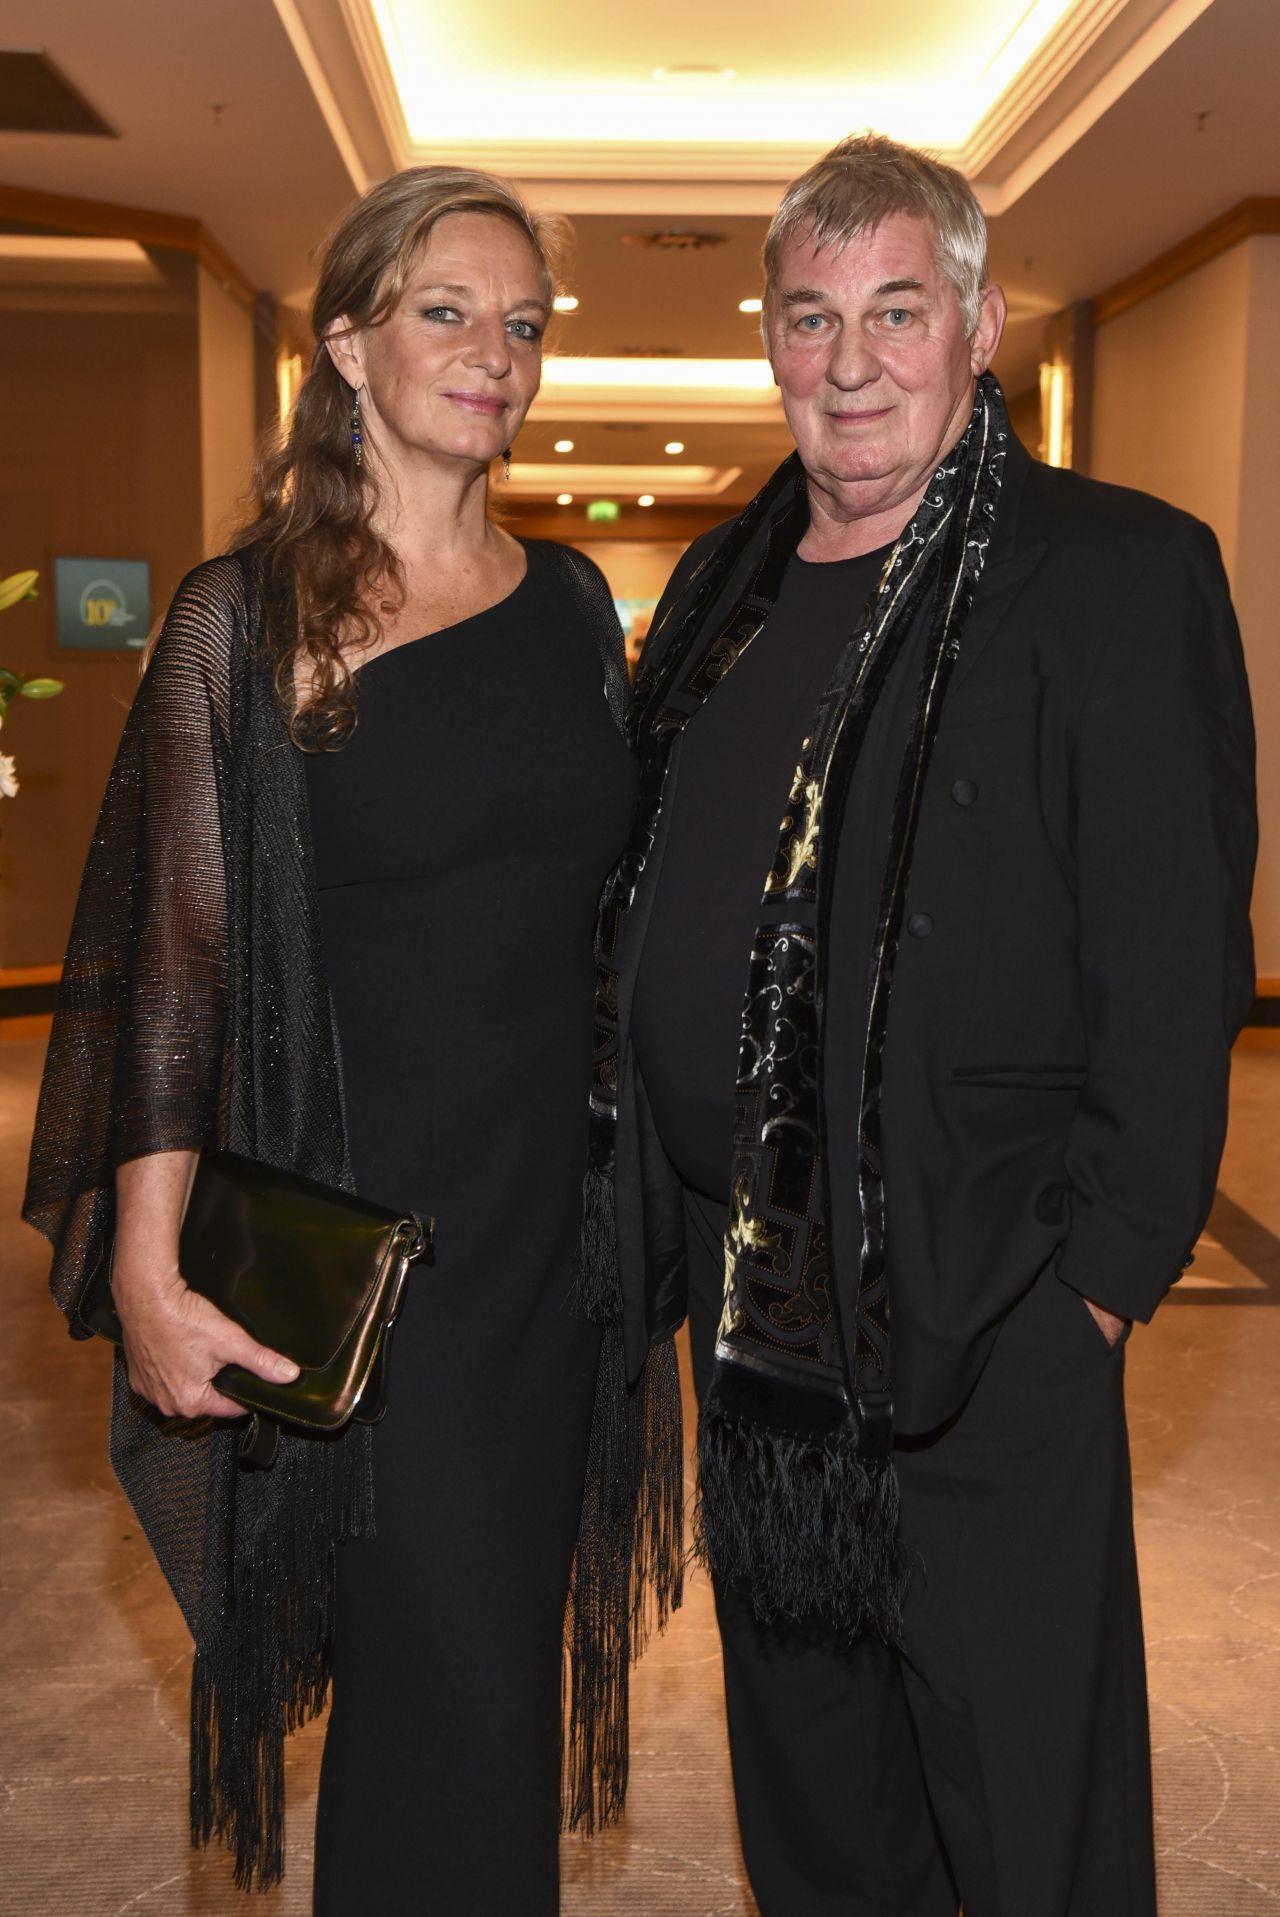 Susanne kemmler grk golf charity masters gala in leipzig naked (42 pic)